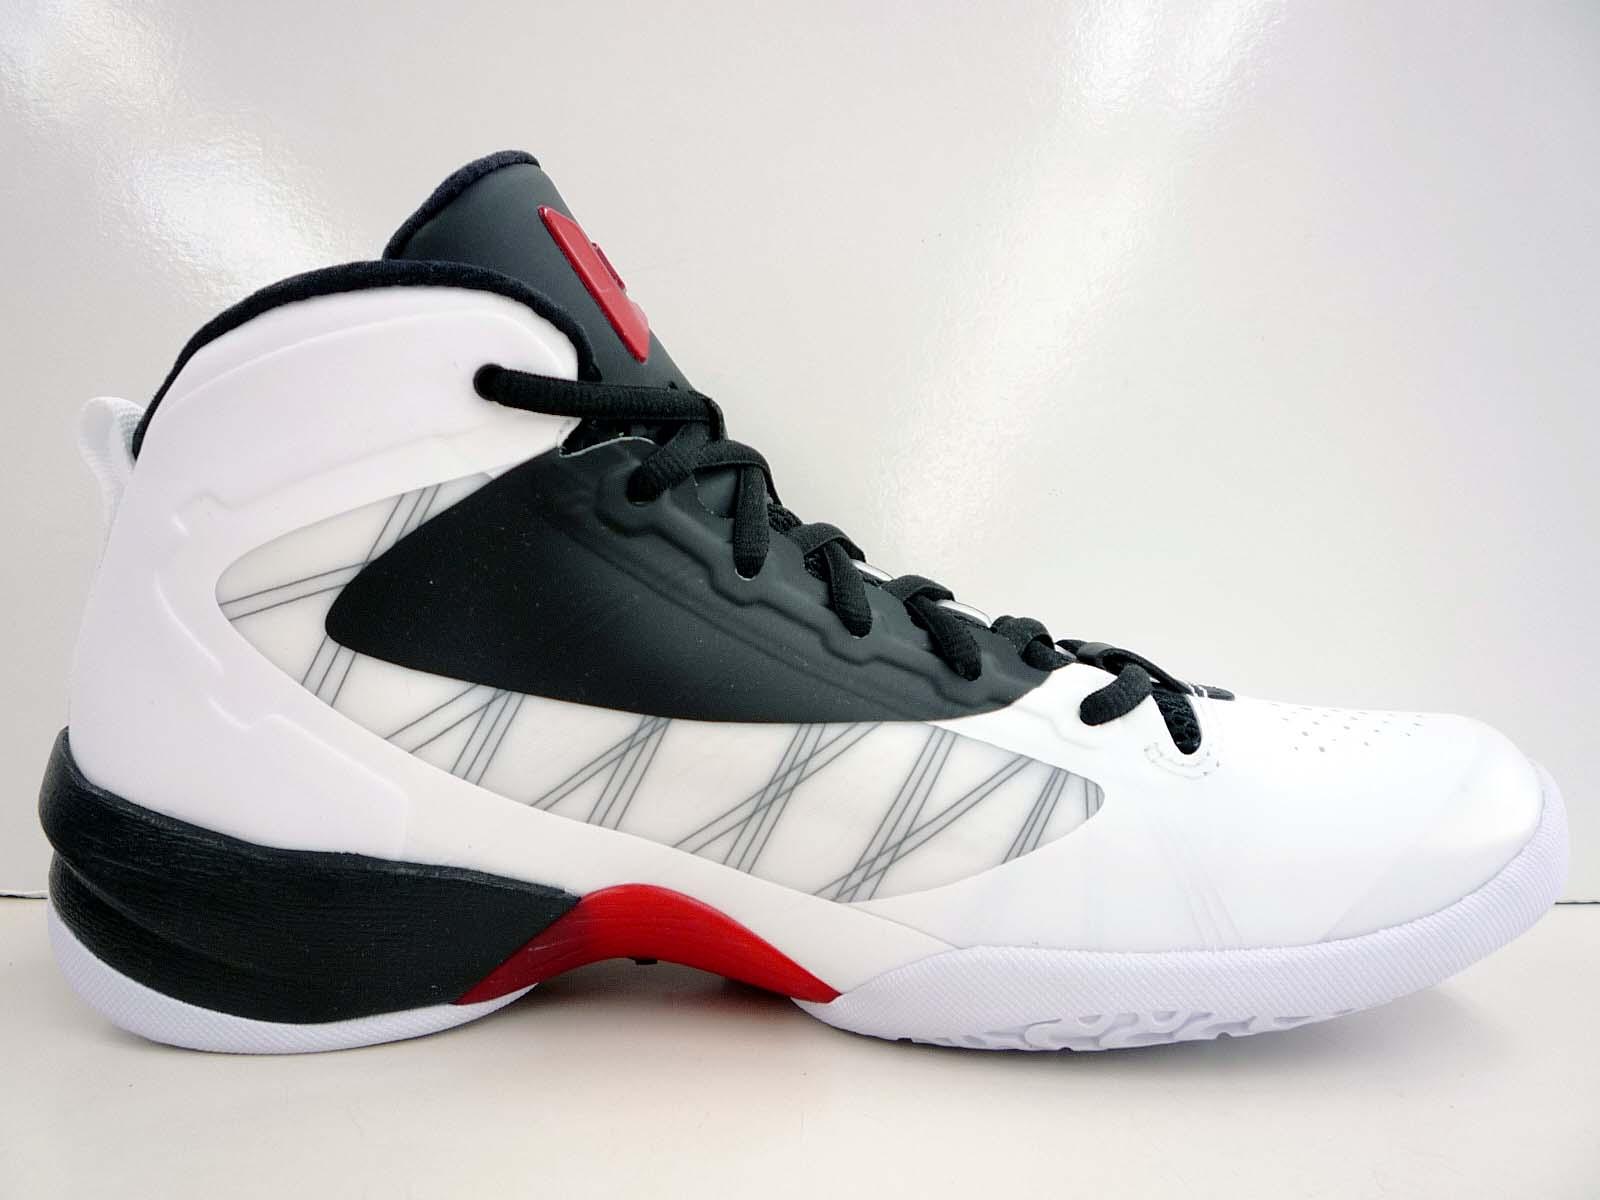 Nike Air Jordan Fly Wade Black Un Blue Pink Miami SOUTH BEACH 429486 030 lebron